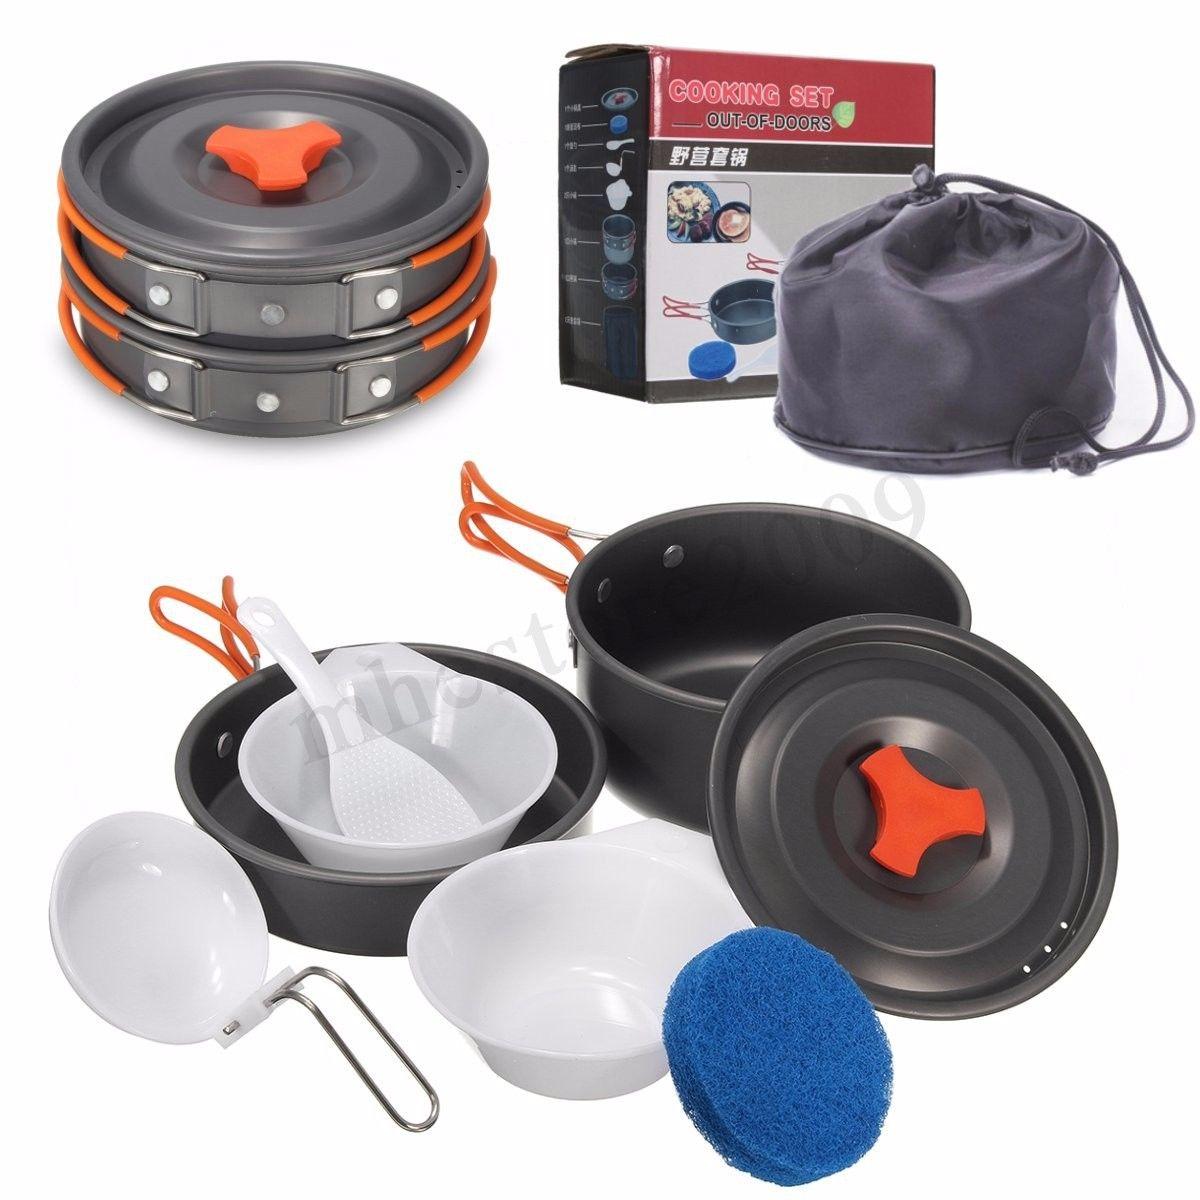 8pcs Outdoor Camping Hiking Cookware Backpacking Cooking Picnic Bowl Pot Pan Set